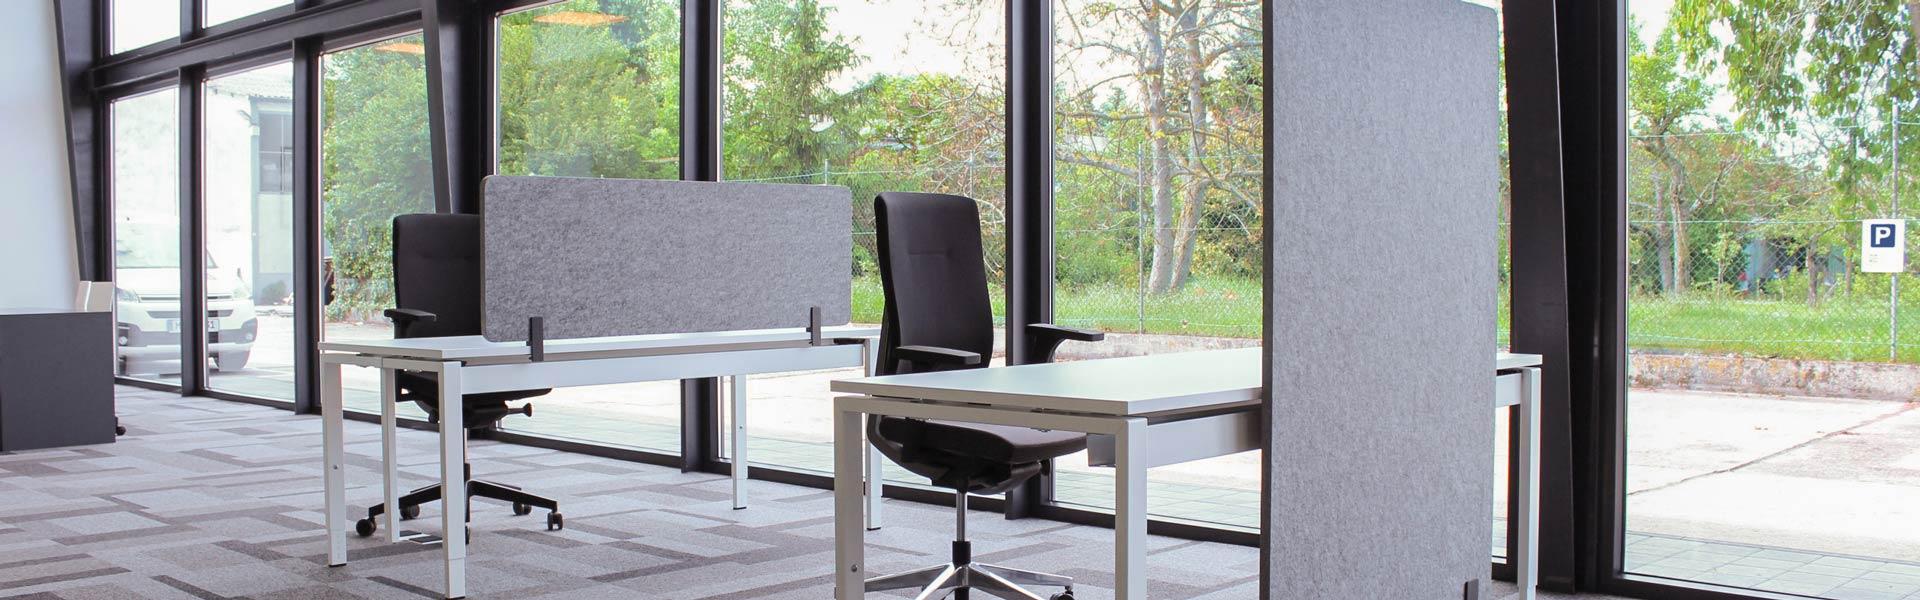 Möbelkonfiguration mit Akustikelementen peTEX